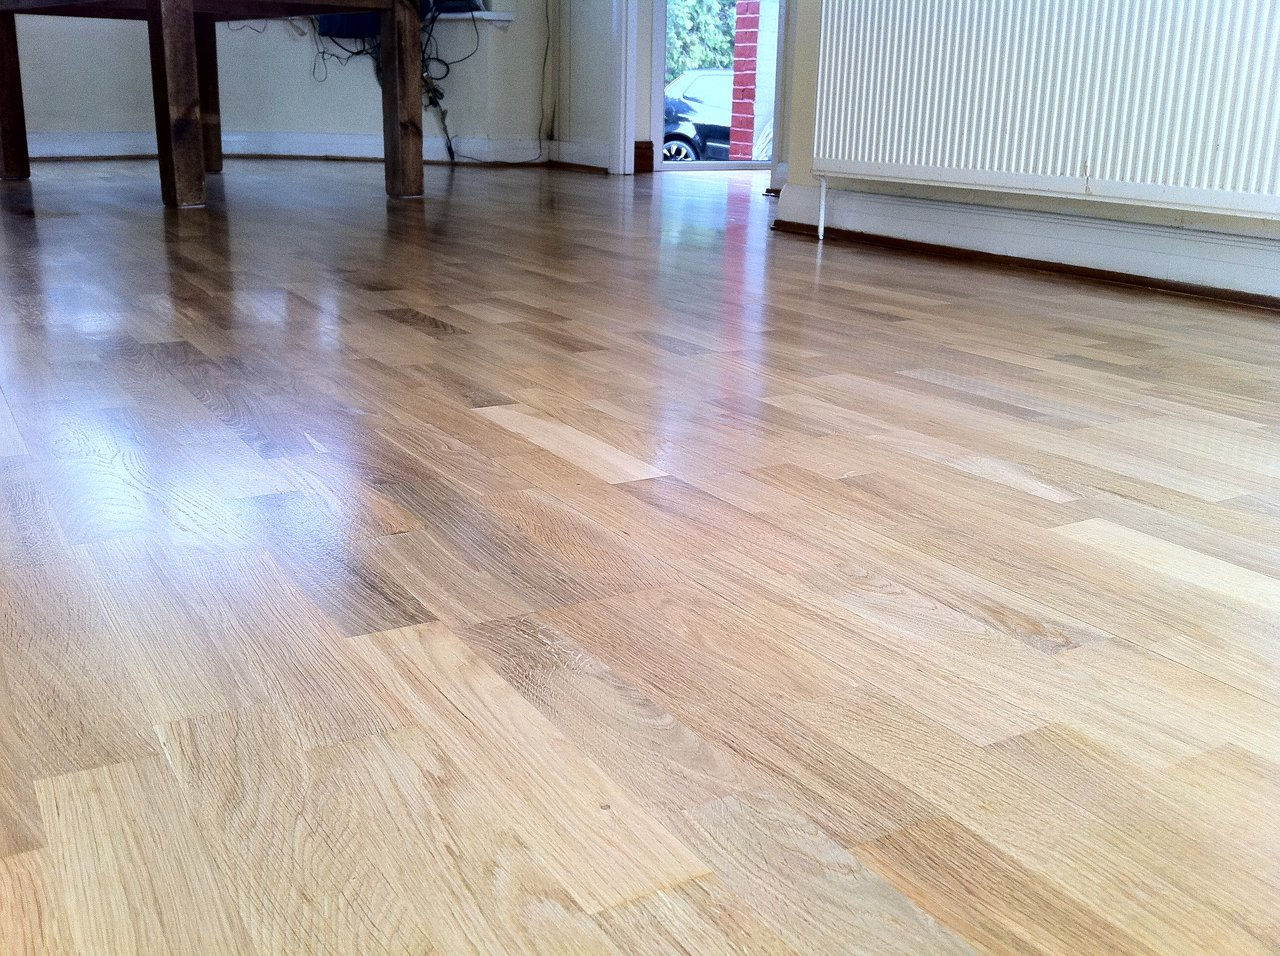 The london wood flooring co - Wooden Floor Sanding Varnishi